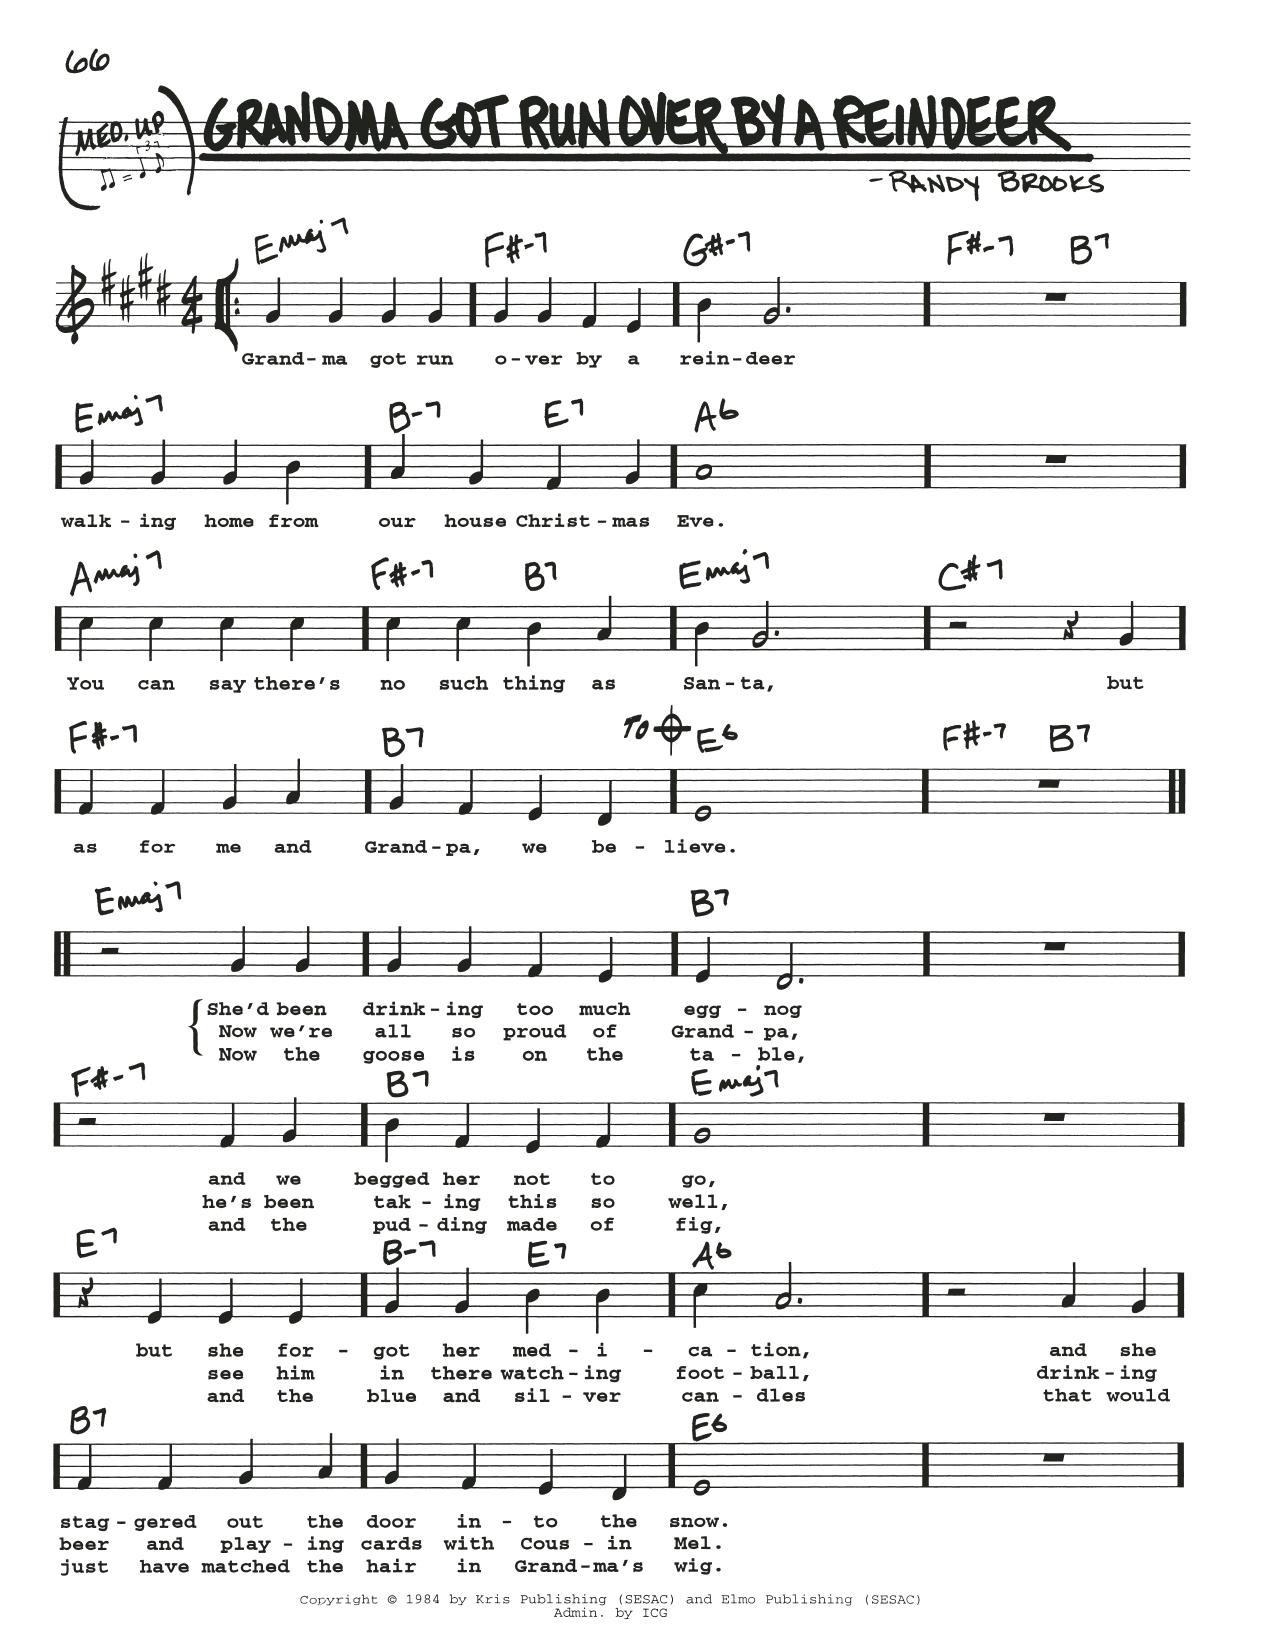 Grandma Got Run Over By A Reindeer Sheet Music   Randy Brooks   Real Book – Melody, Lyrics & Chords